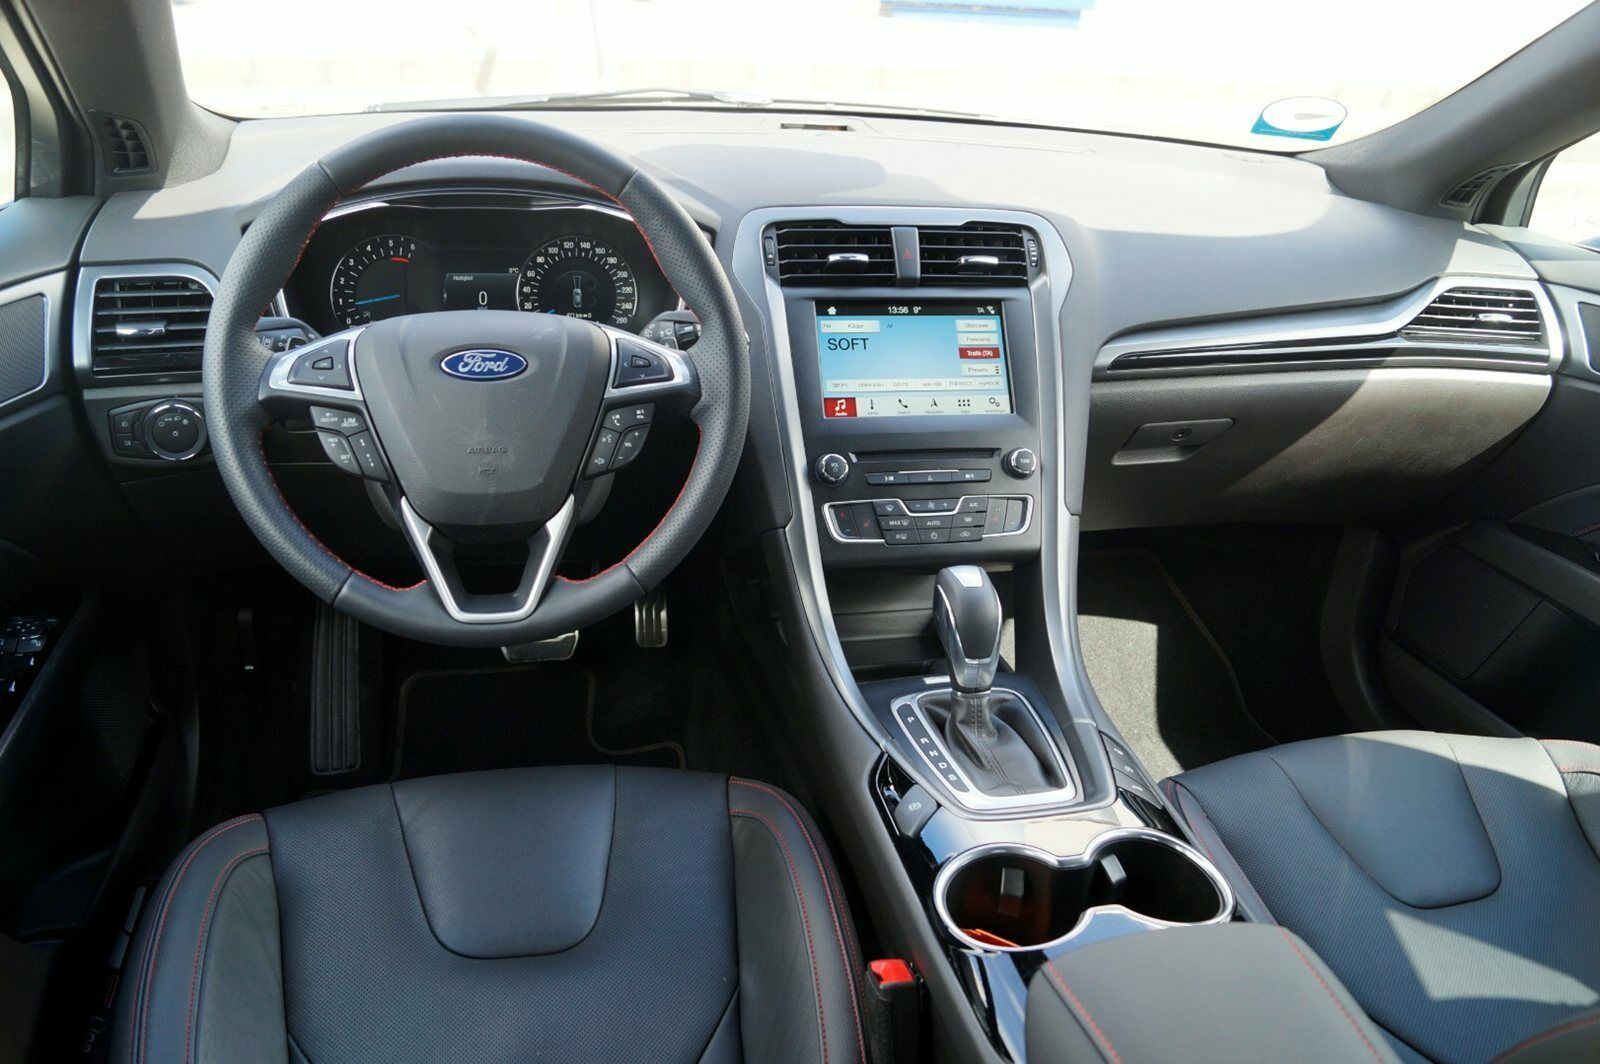 Ford Mondeo 2,0 TDCi 180 ST-Line aut. - billede 6